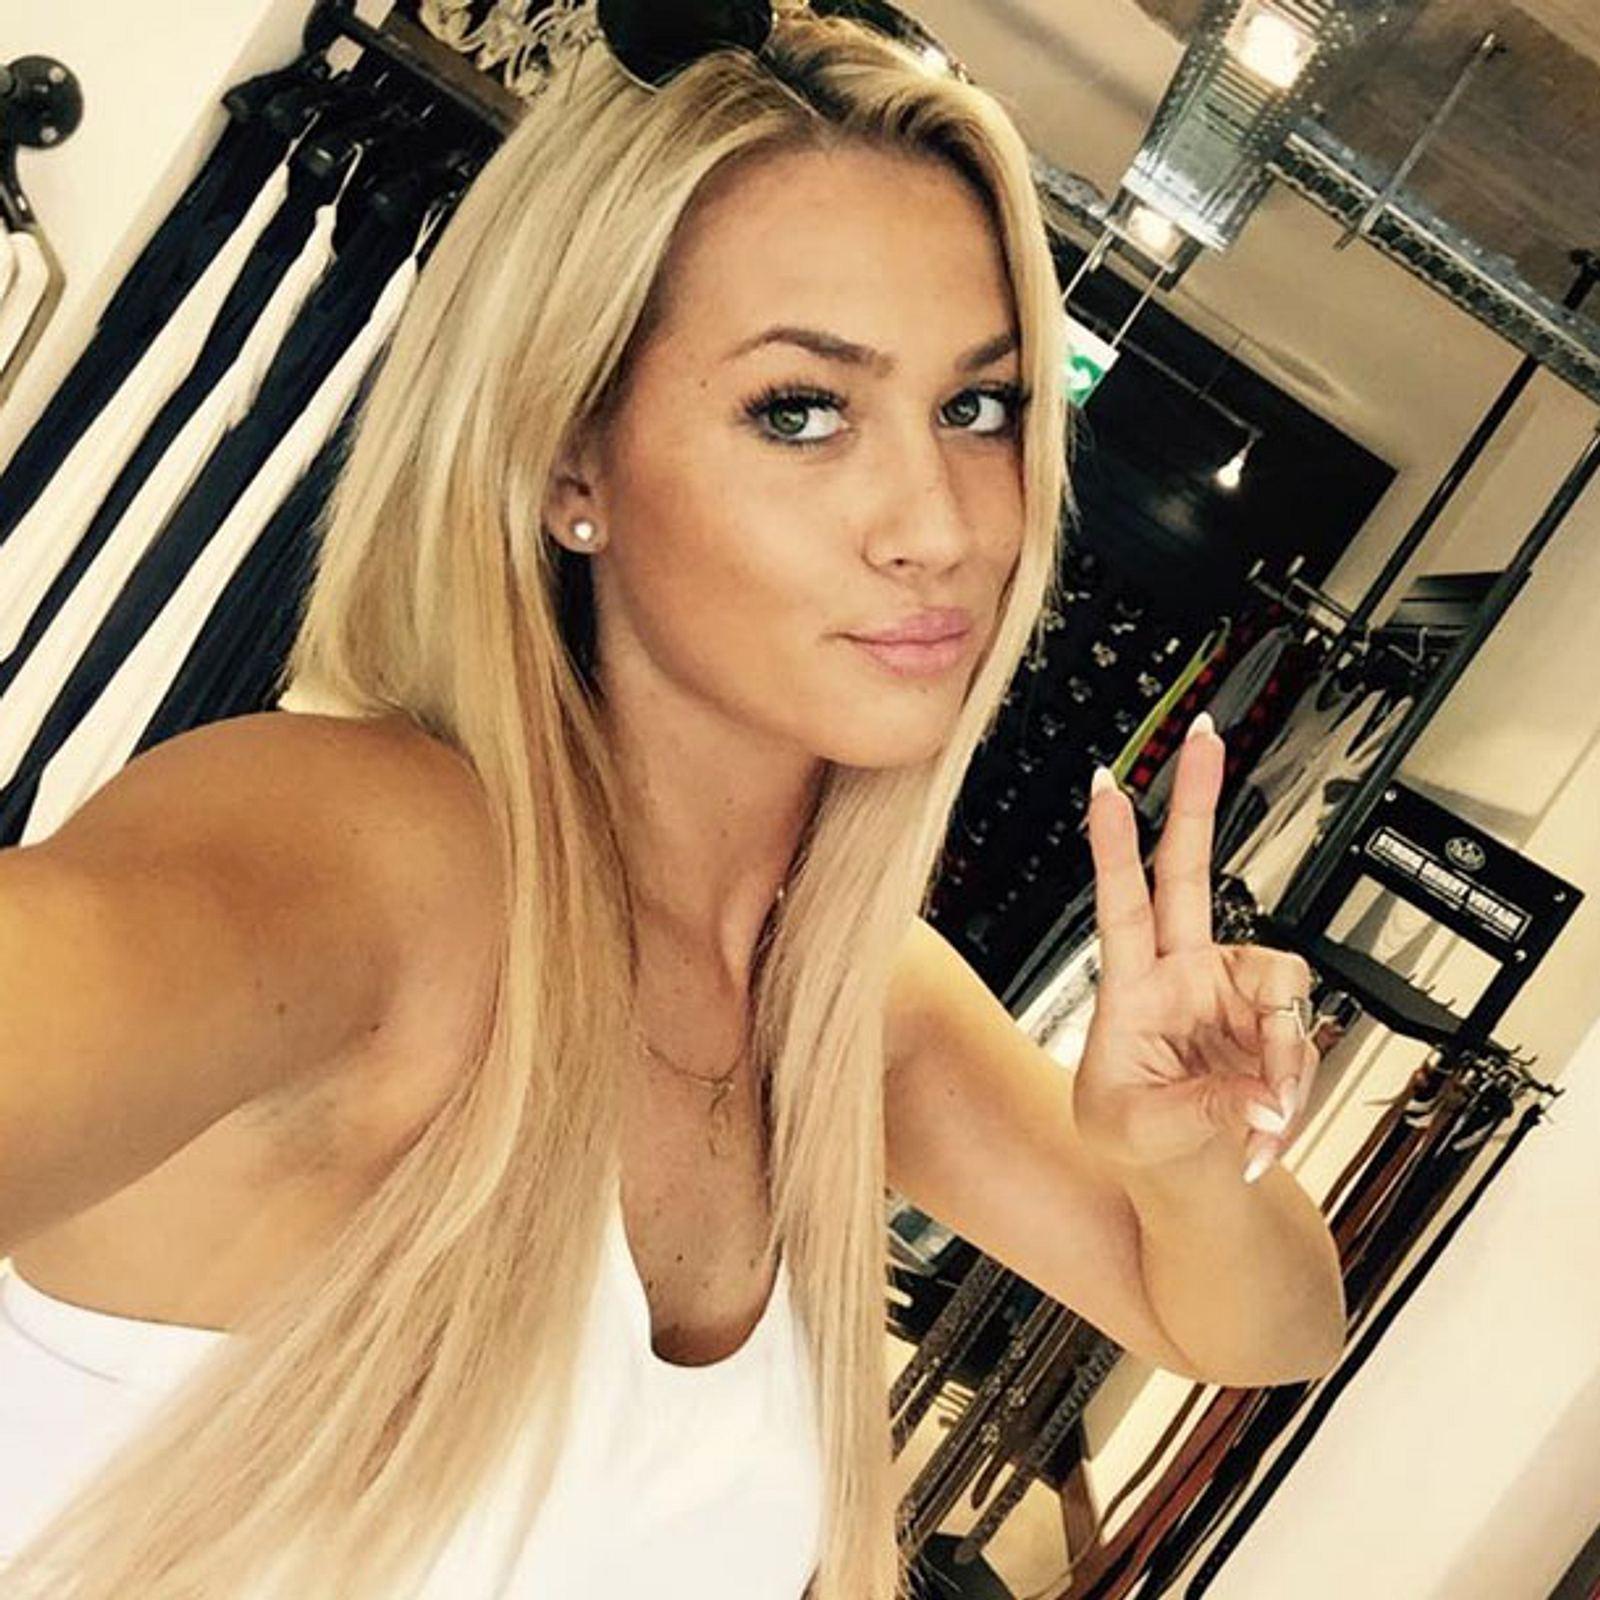 Promi Big Brother: So sah Jessica Paszka früher aus | InTouch